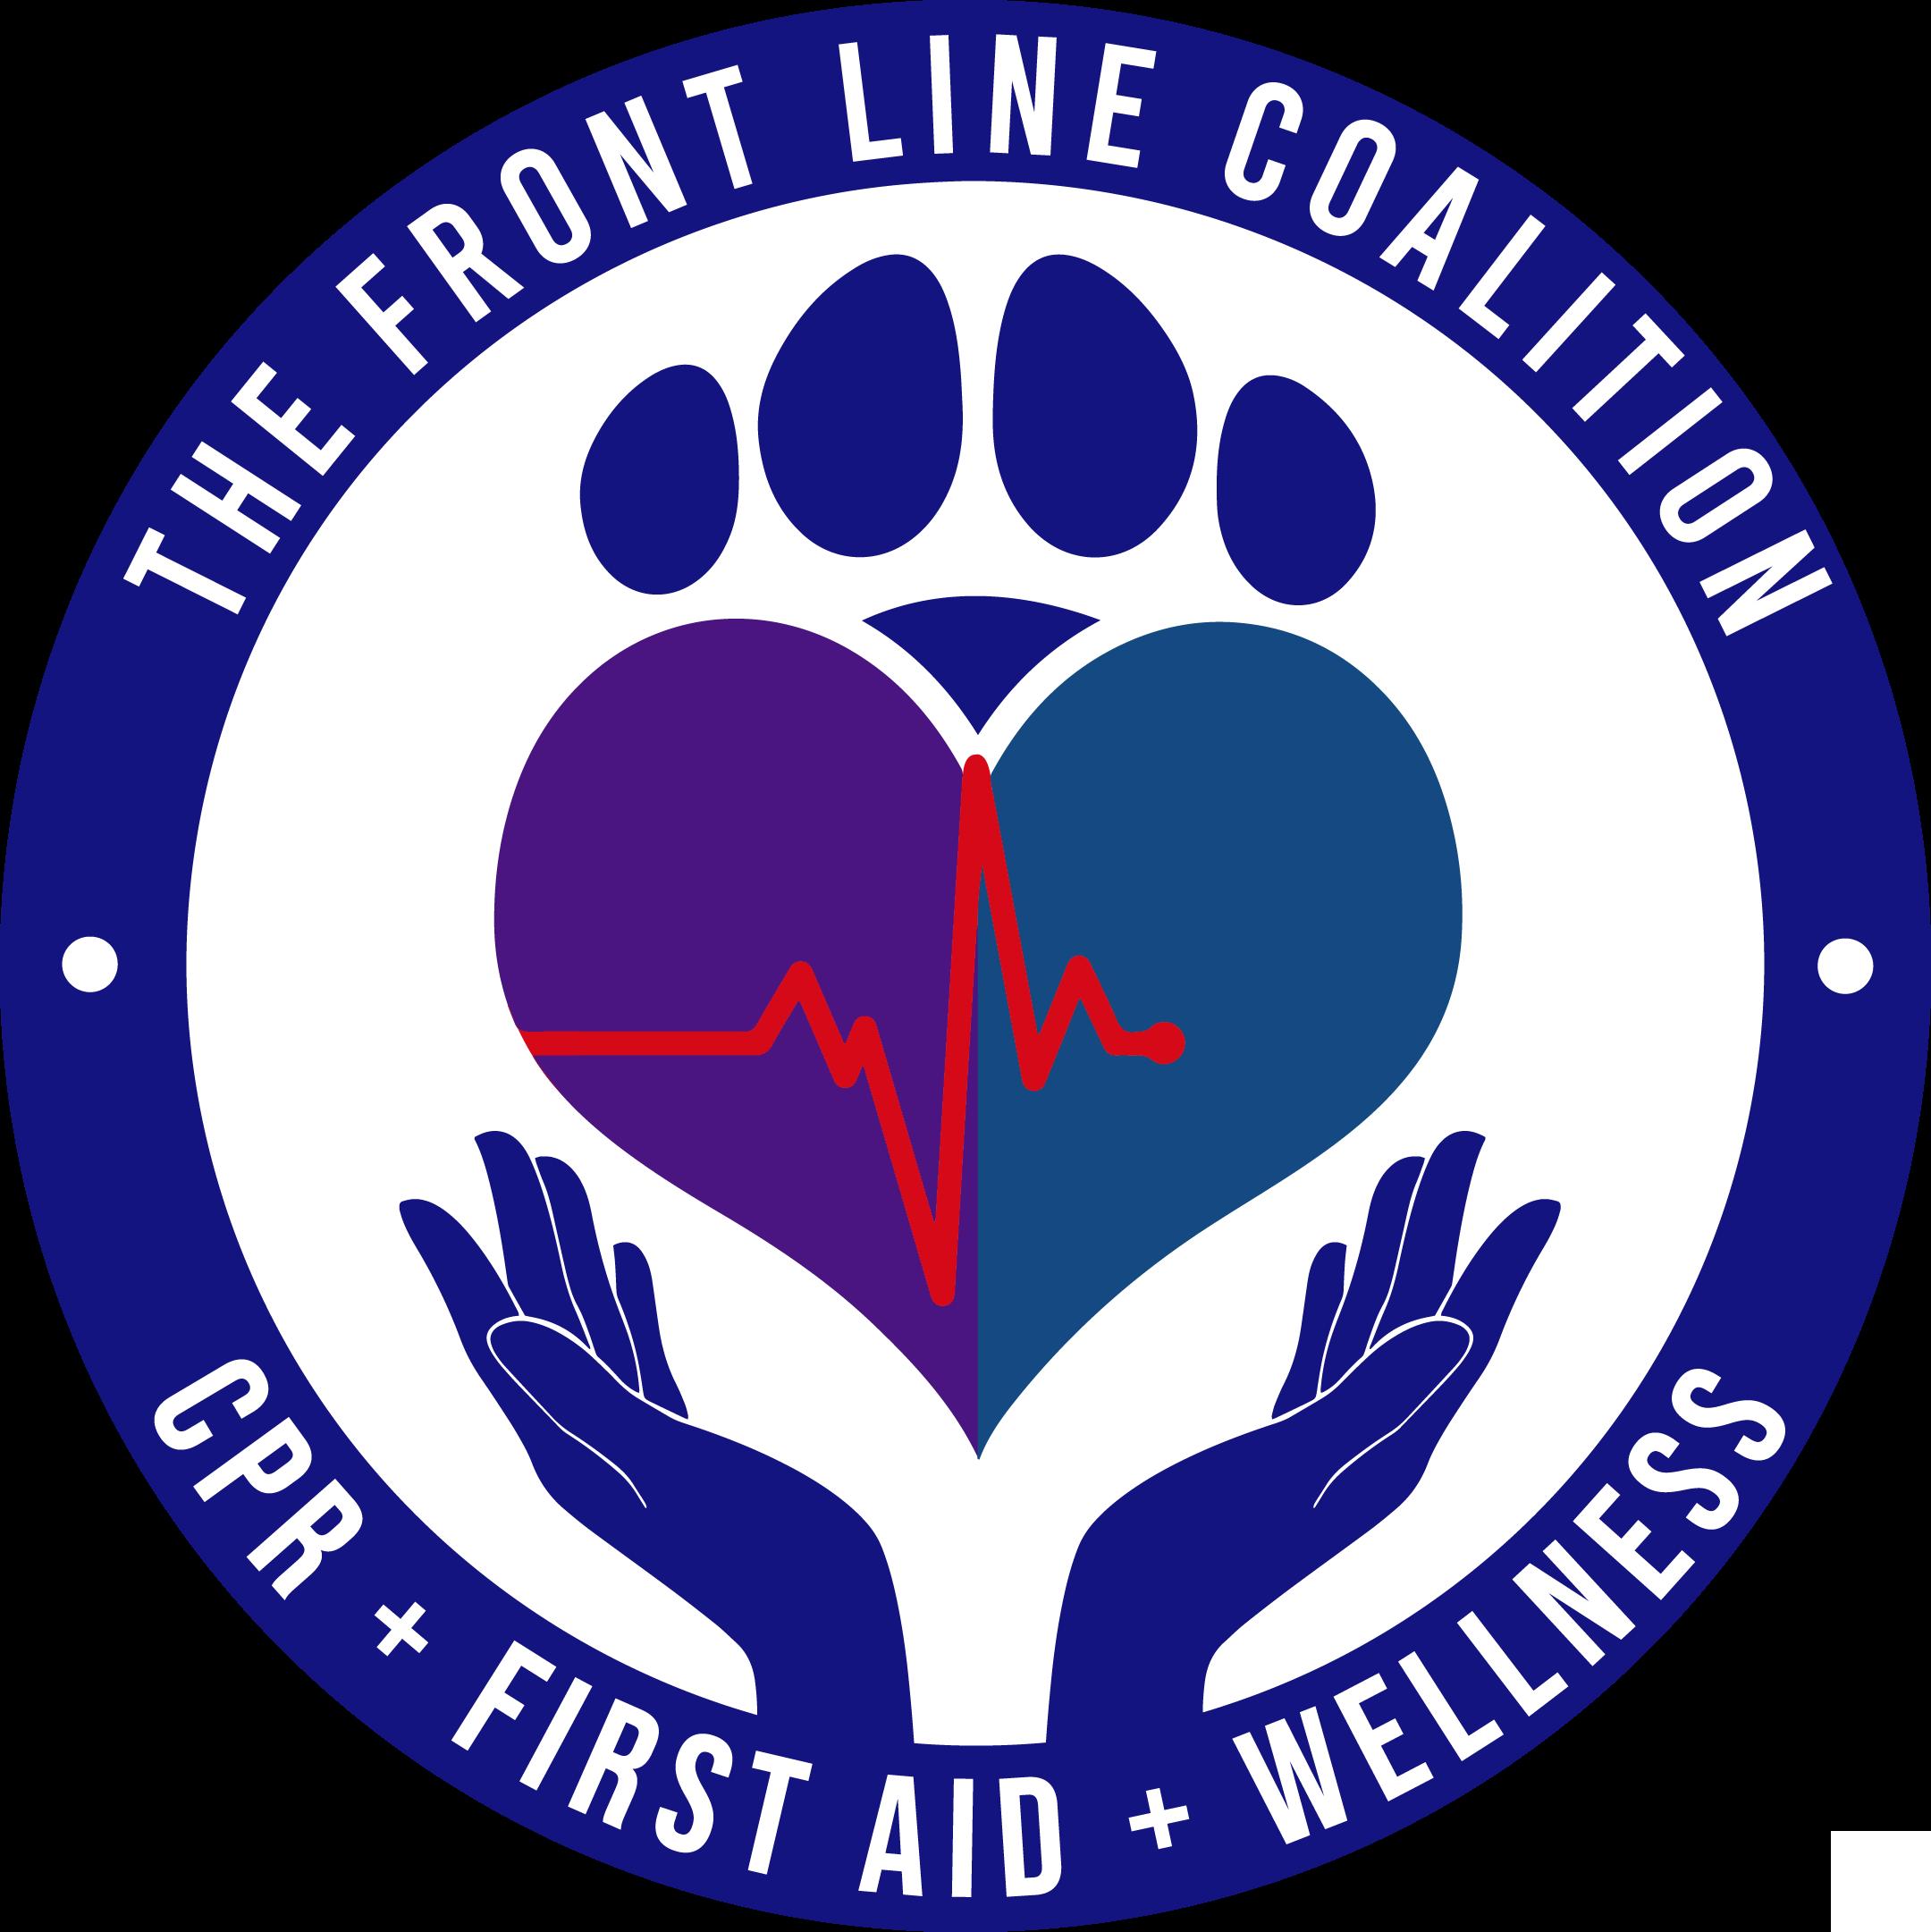 The Frontline Coalition Logo